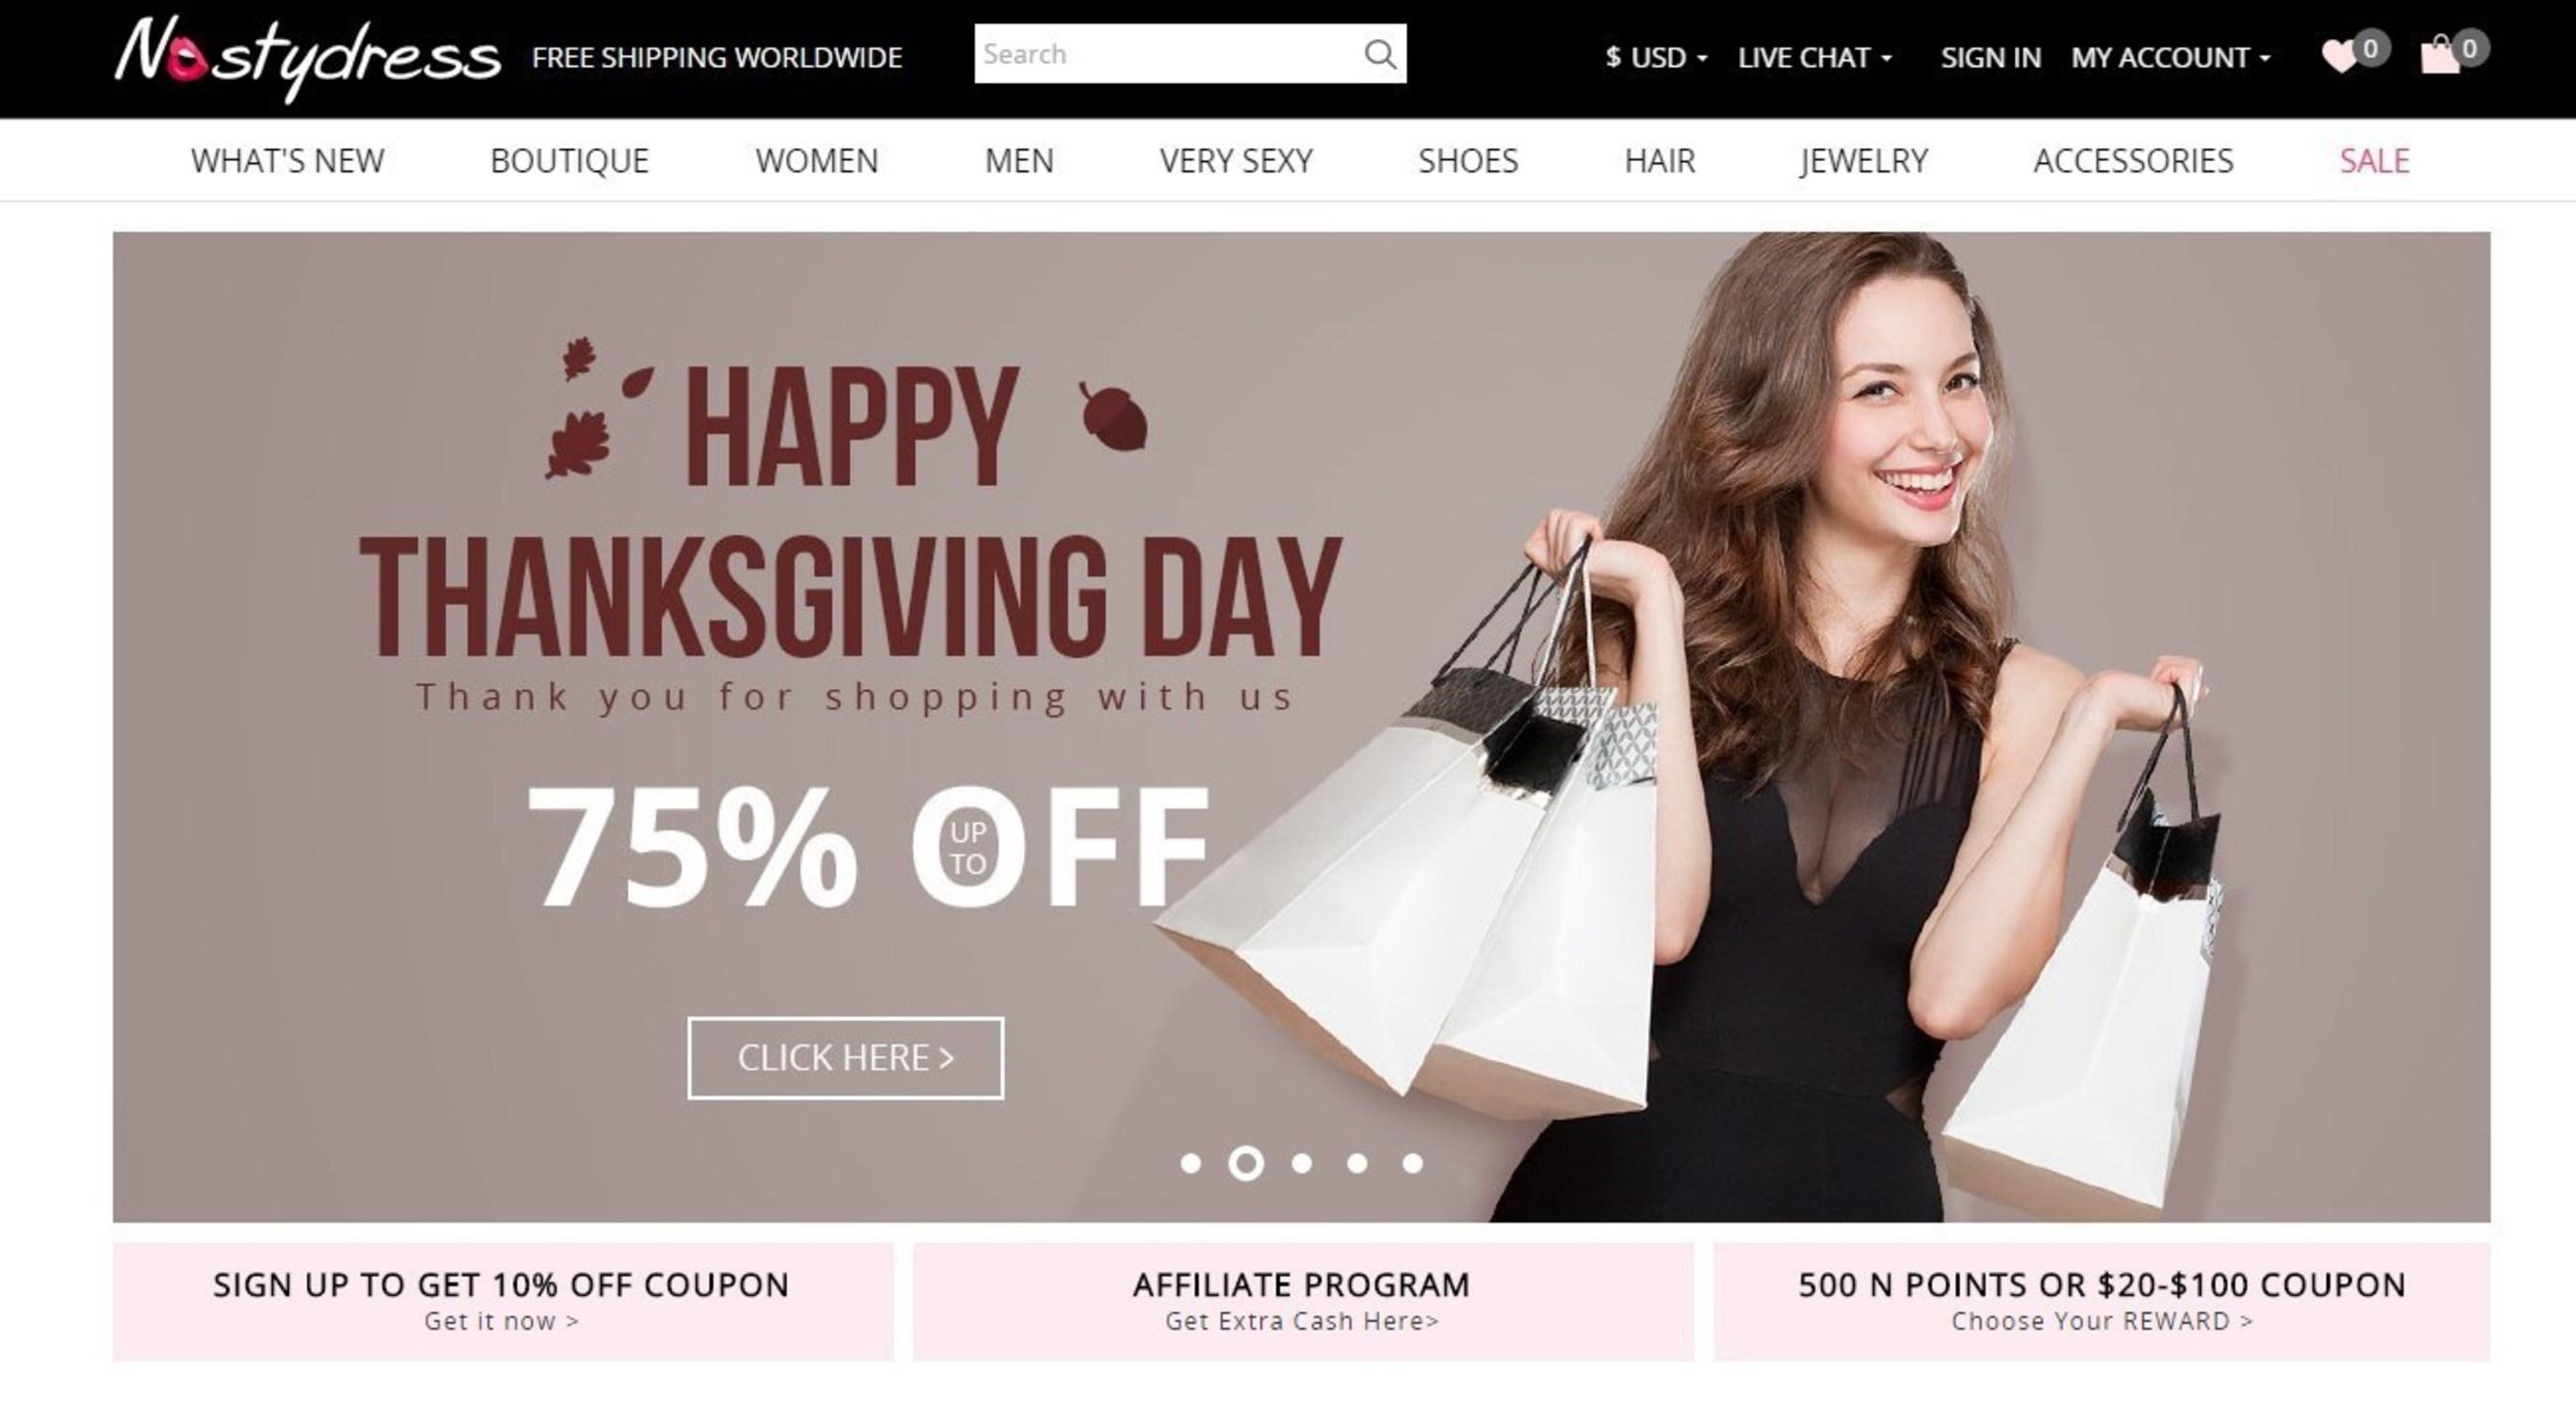 DressLily and Nastydress Superb Customer Service